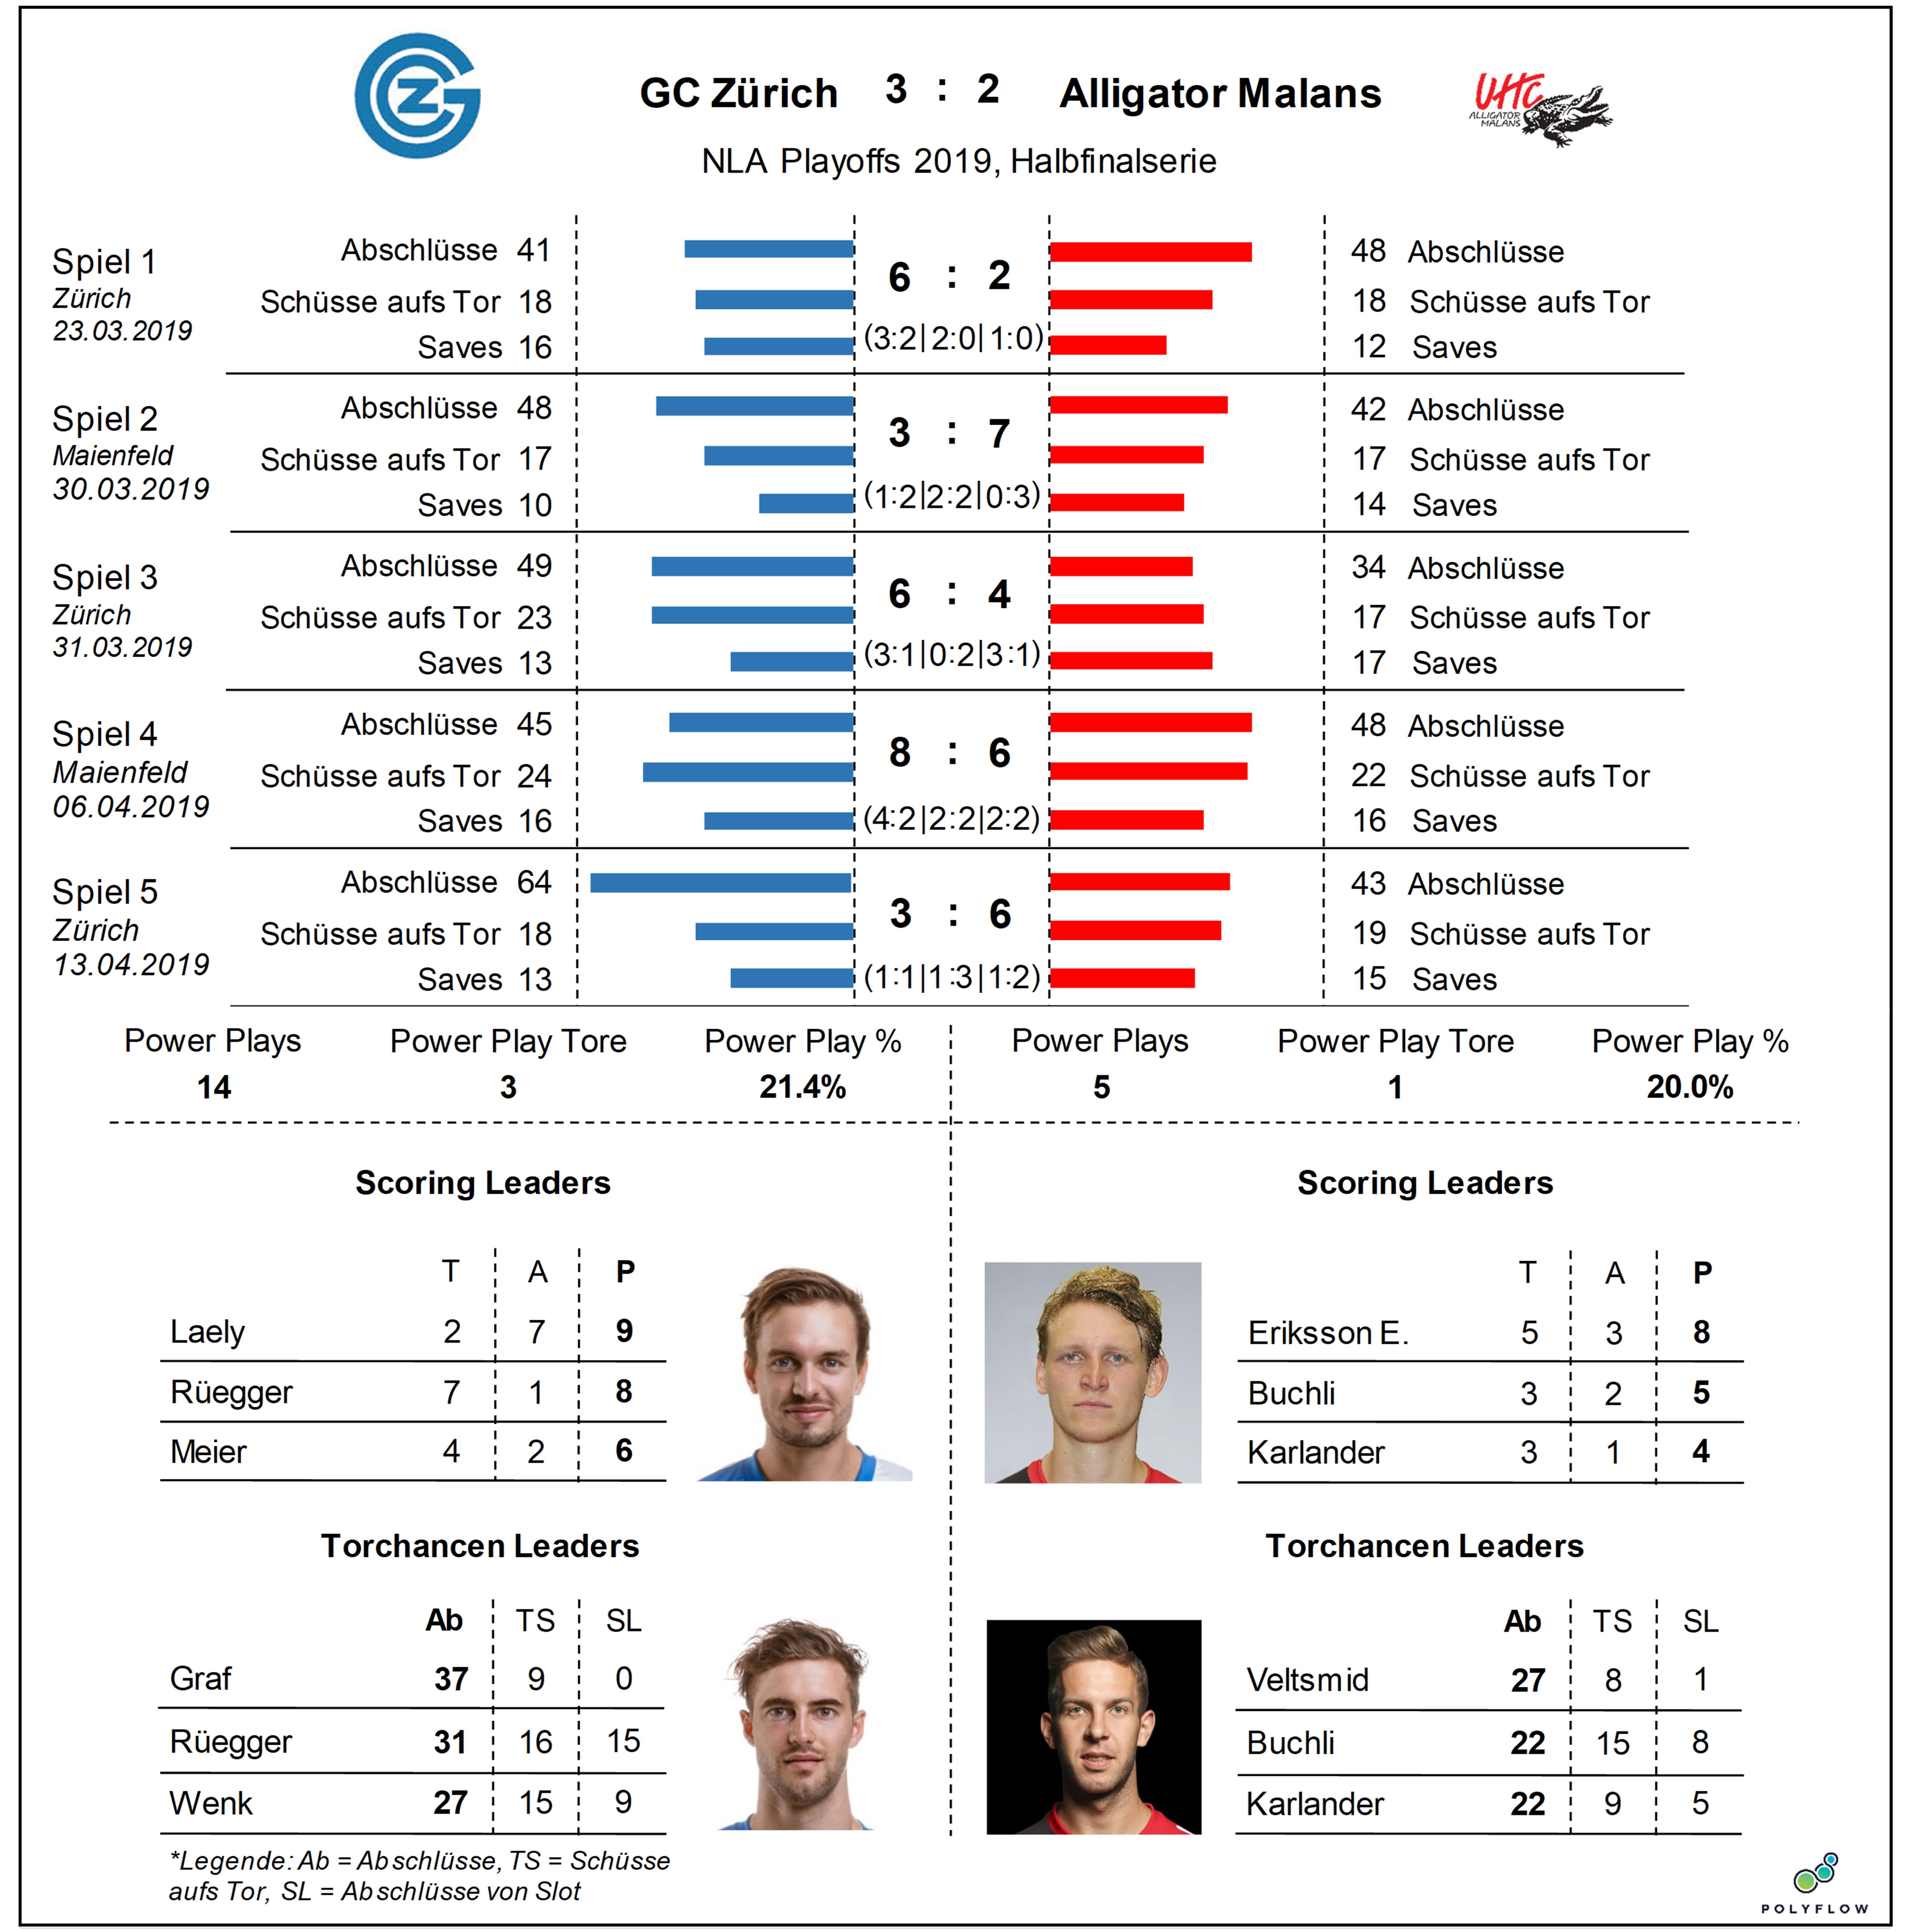 GC-Malans_Spiel 5.jpg